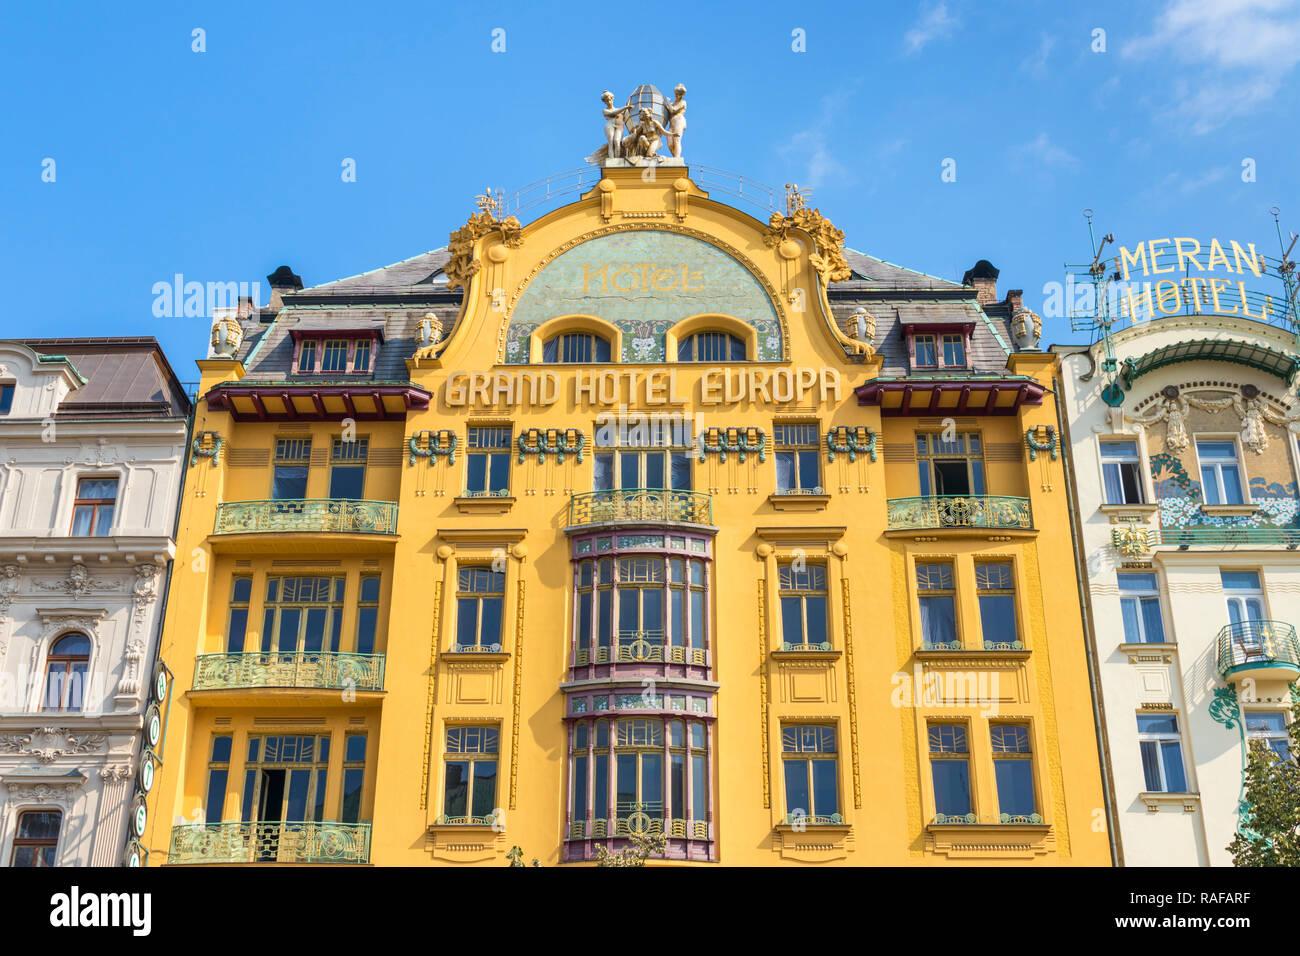 Prague Grand Hotel Europa Prague an Art Nouveau hotel building on Wenceslas Square historic Centre Vaclavske namesti Prague Czech Republic Europe - Stock Image